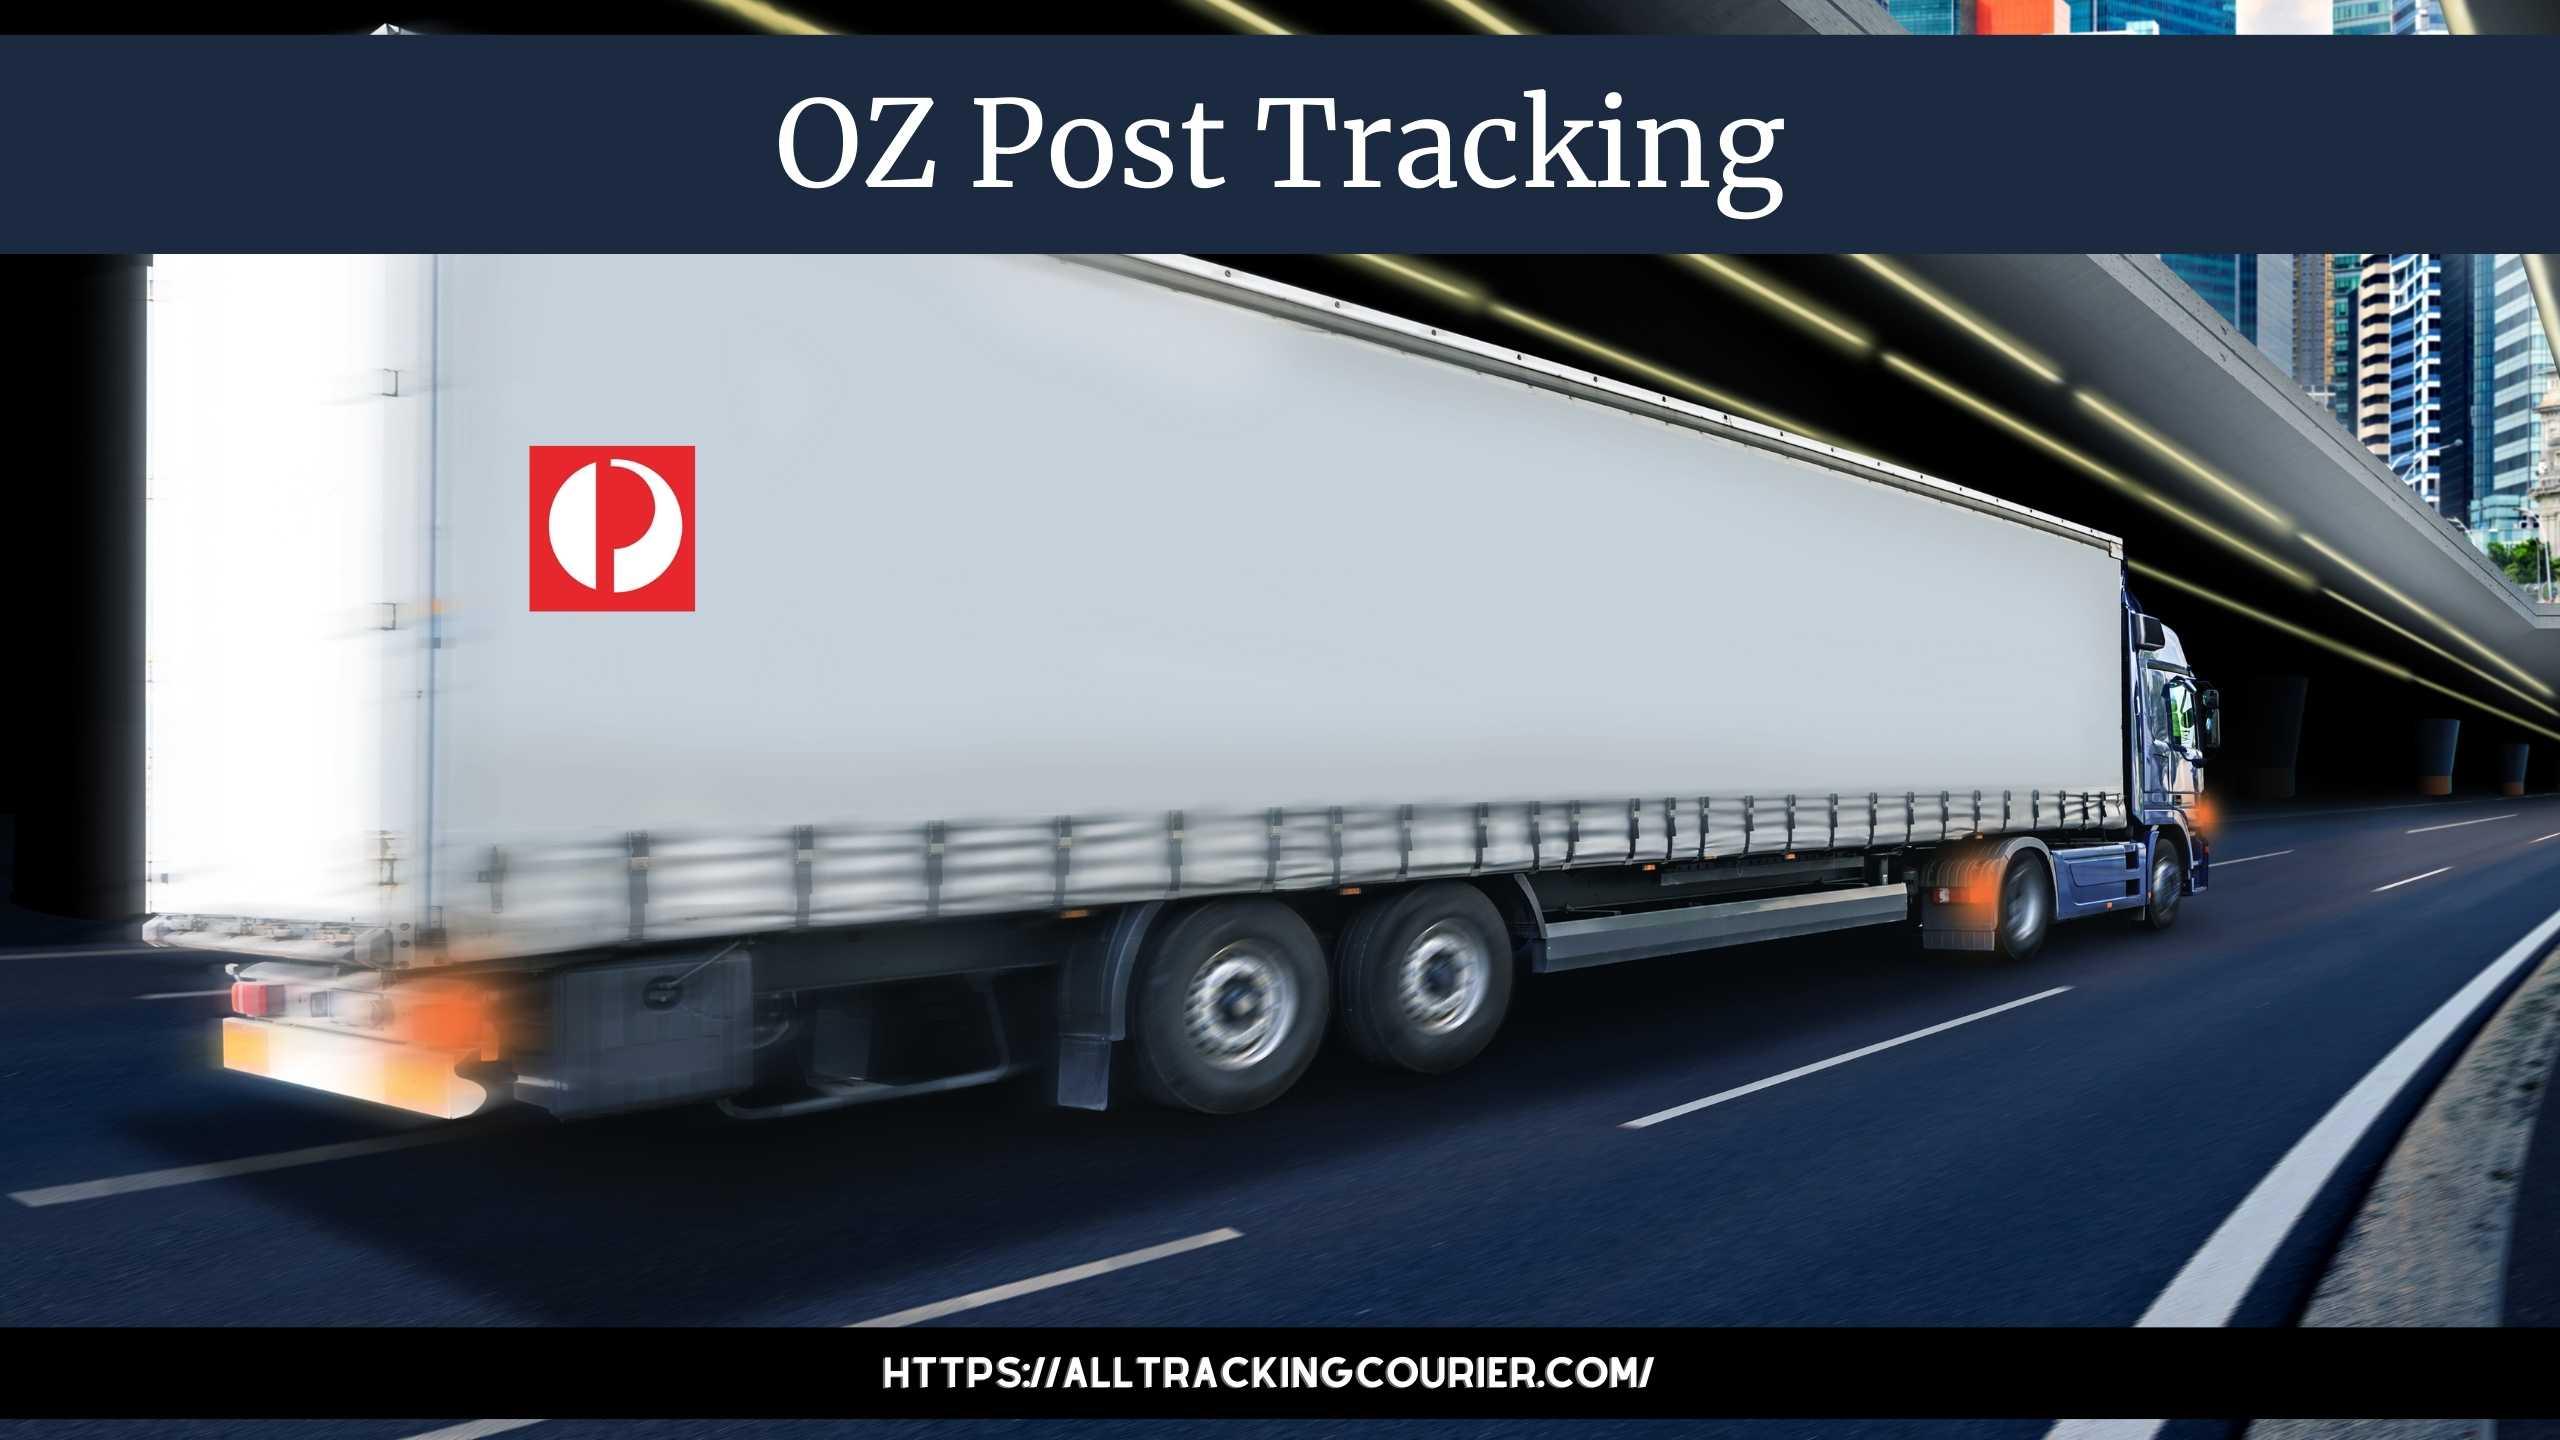 OZ Post Tracking